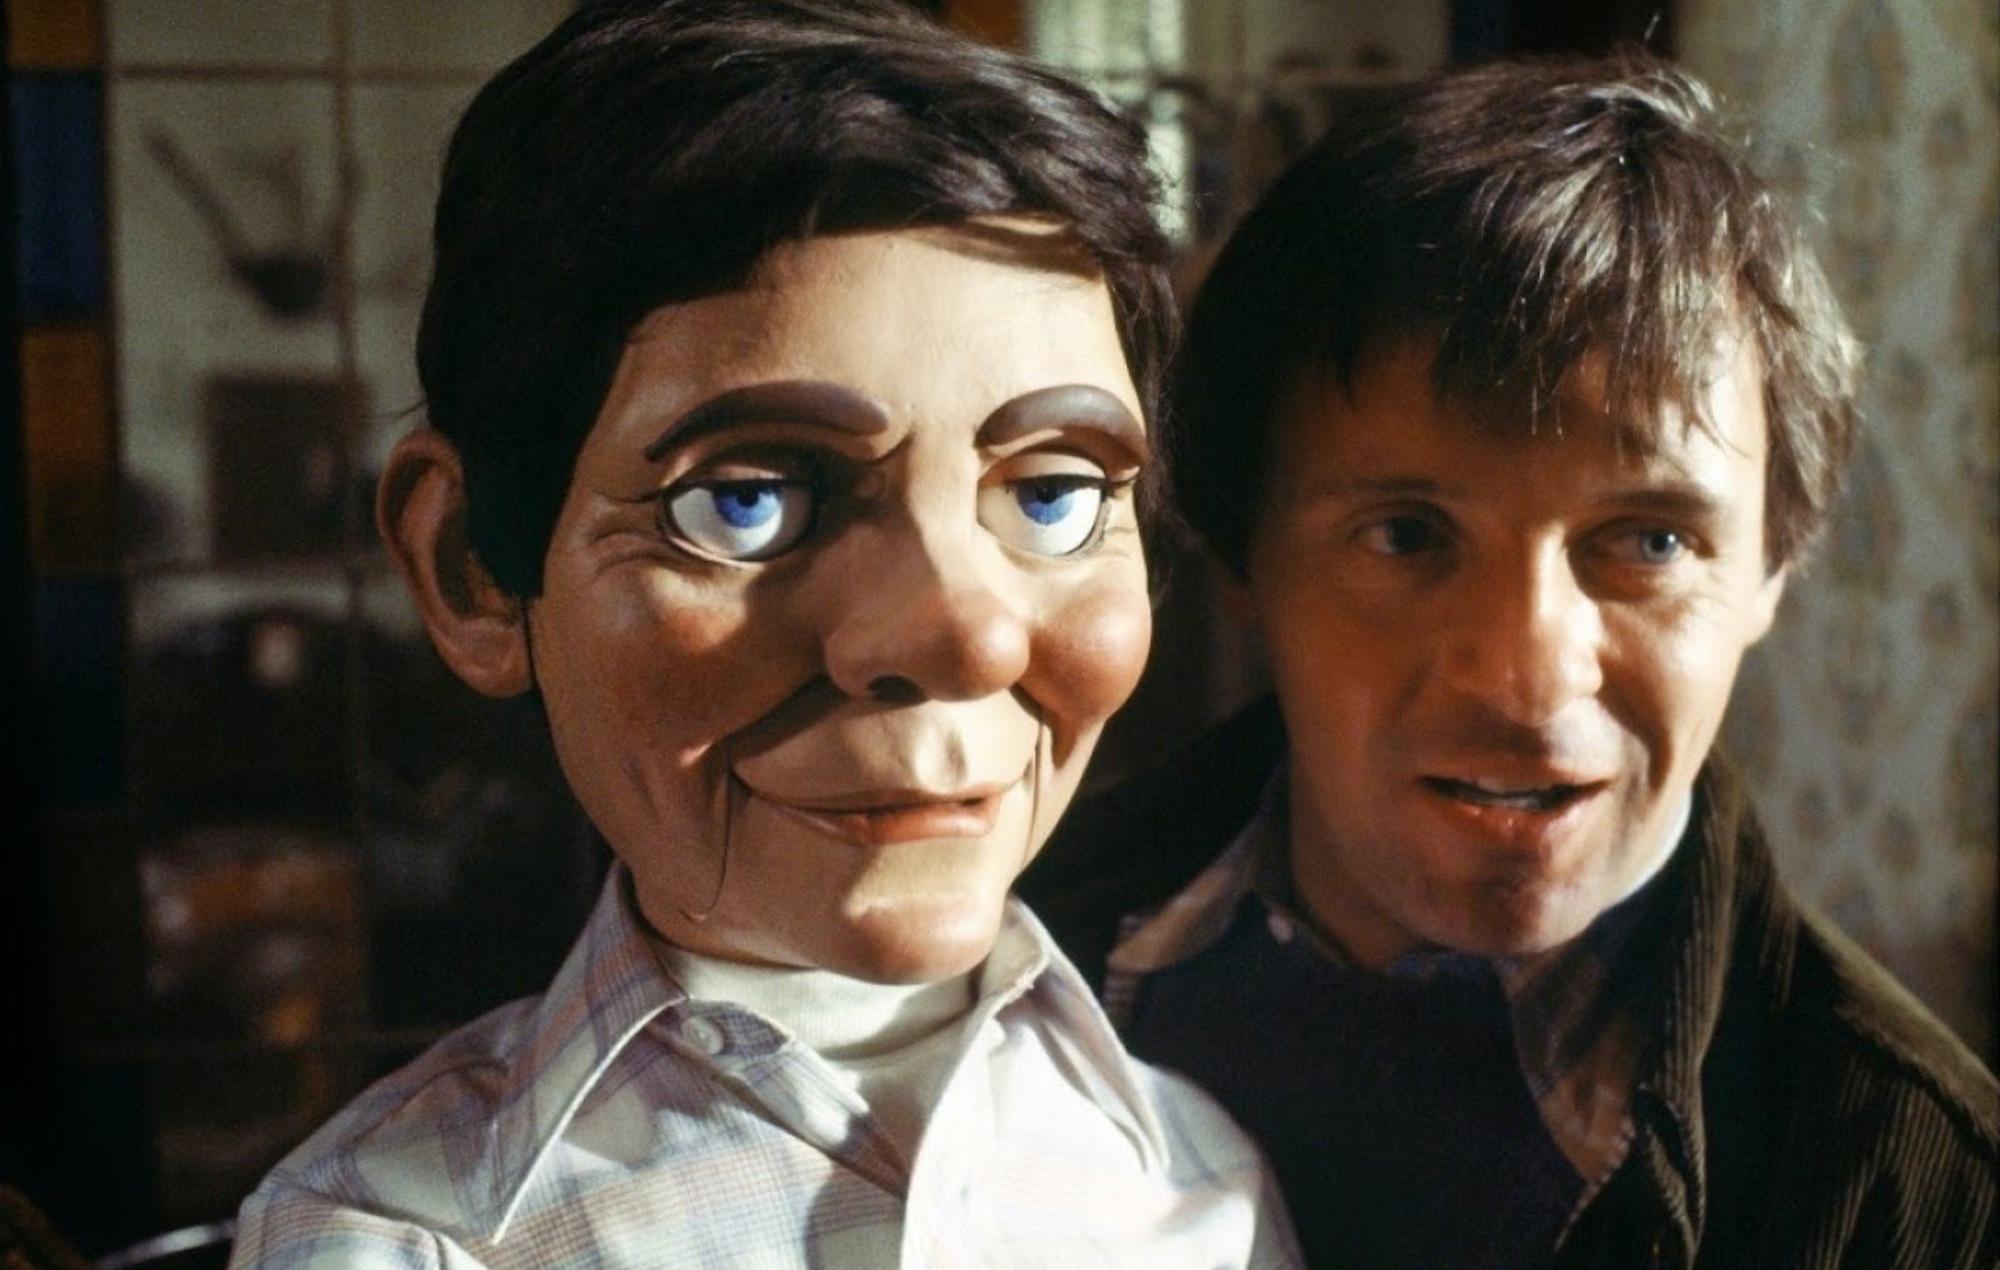 The doll Fats in film Magic